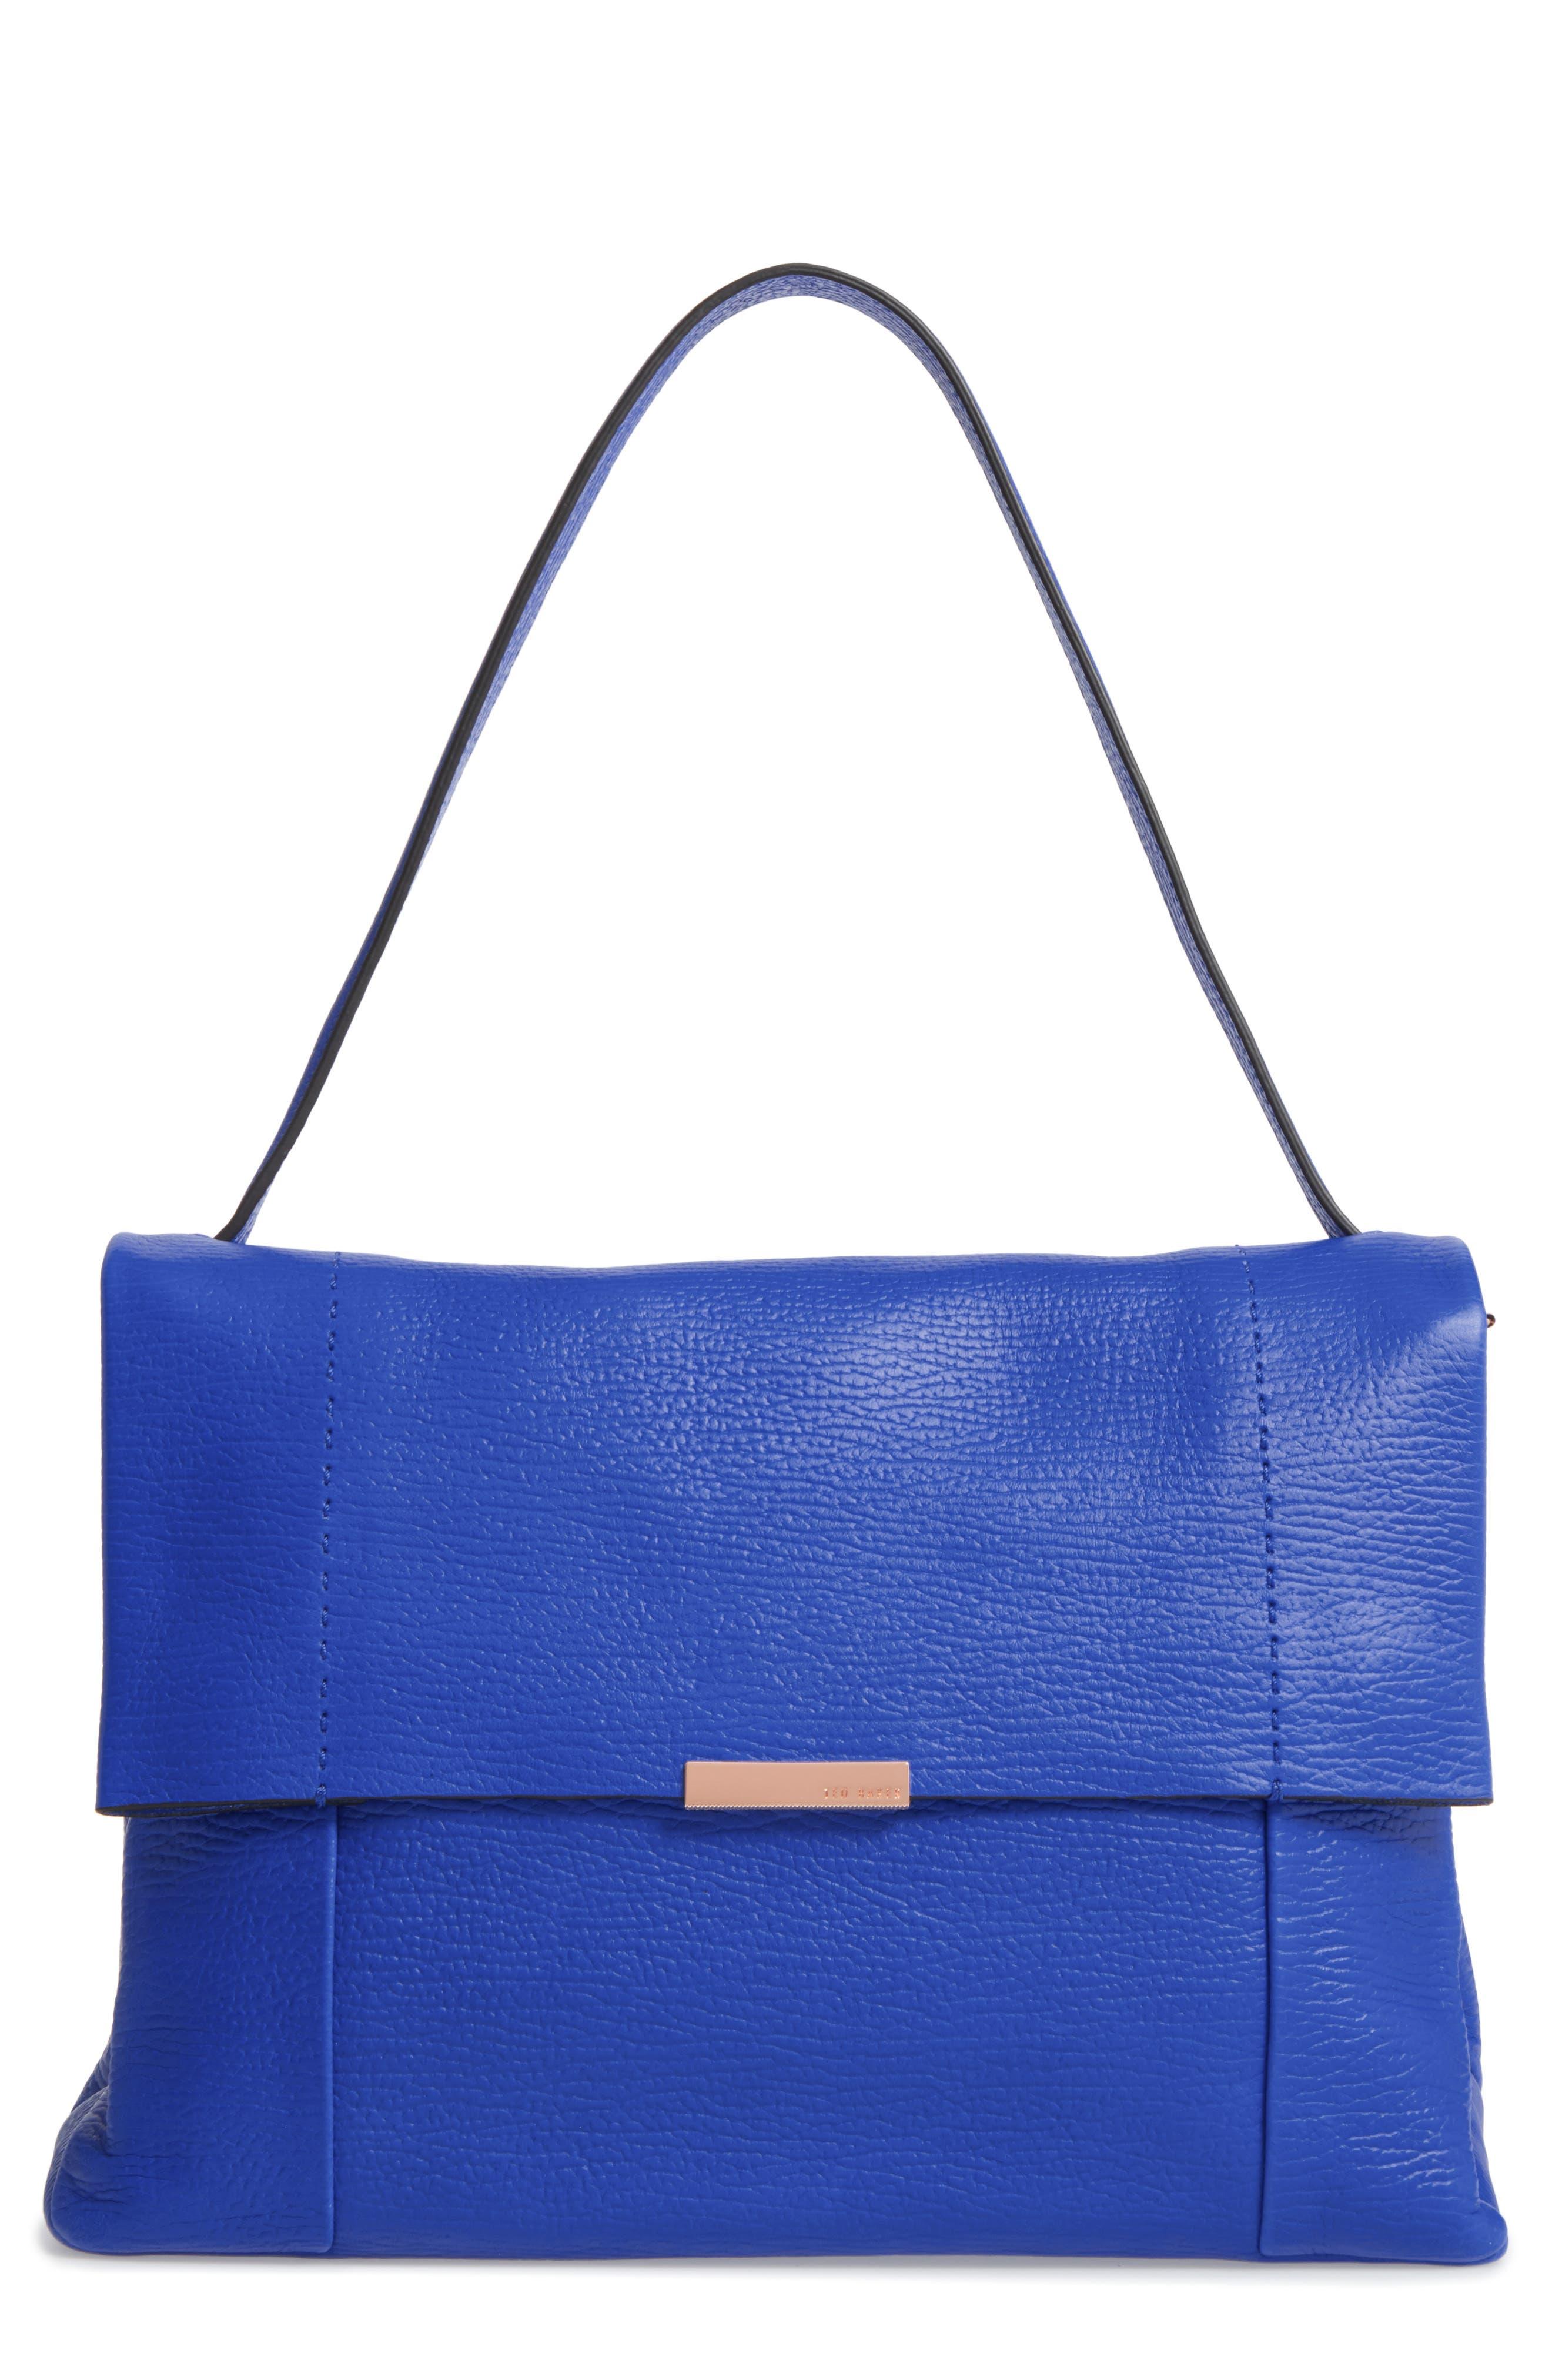 Proter Leather Shoulder Bag,                             Main thumbnail 1, color,                             Bright Blue